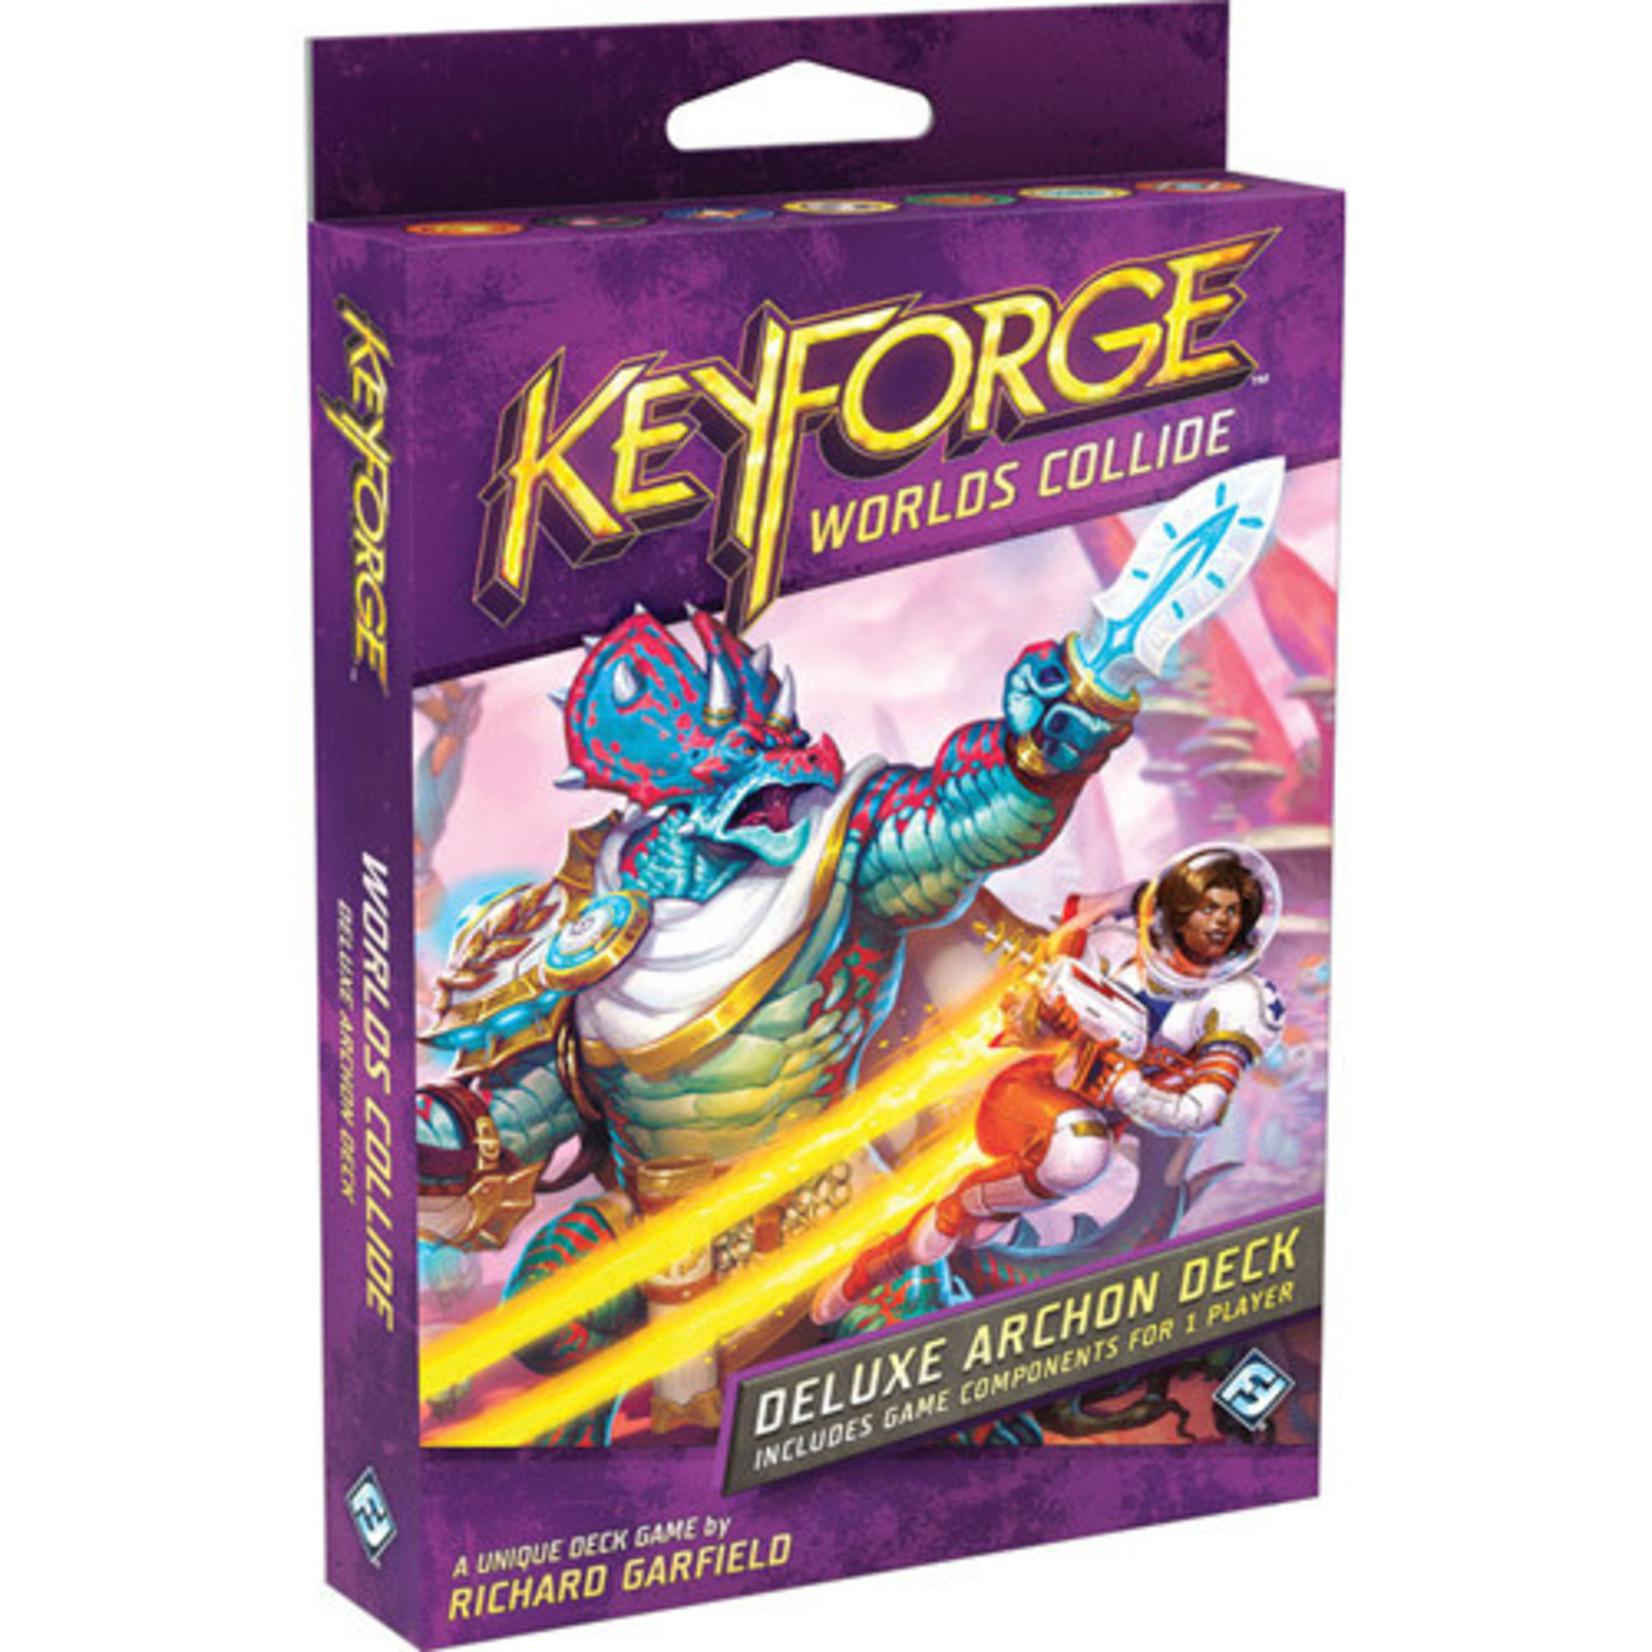 KeyForge: Worlds Collide Deluxe Deck